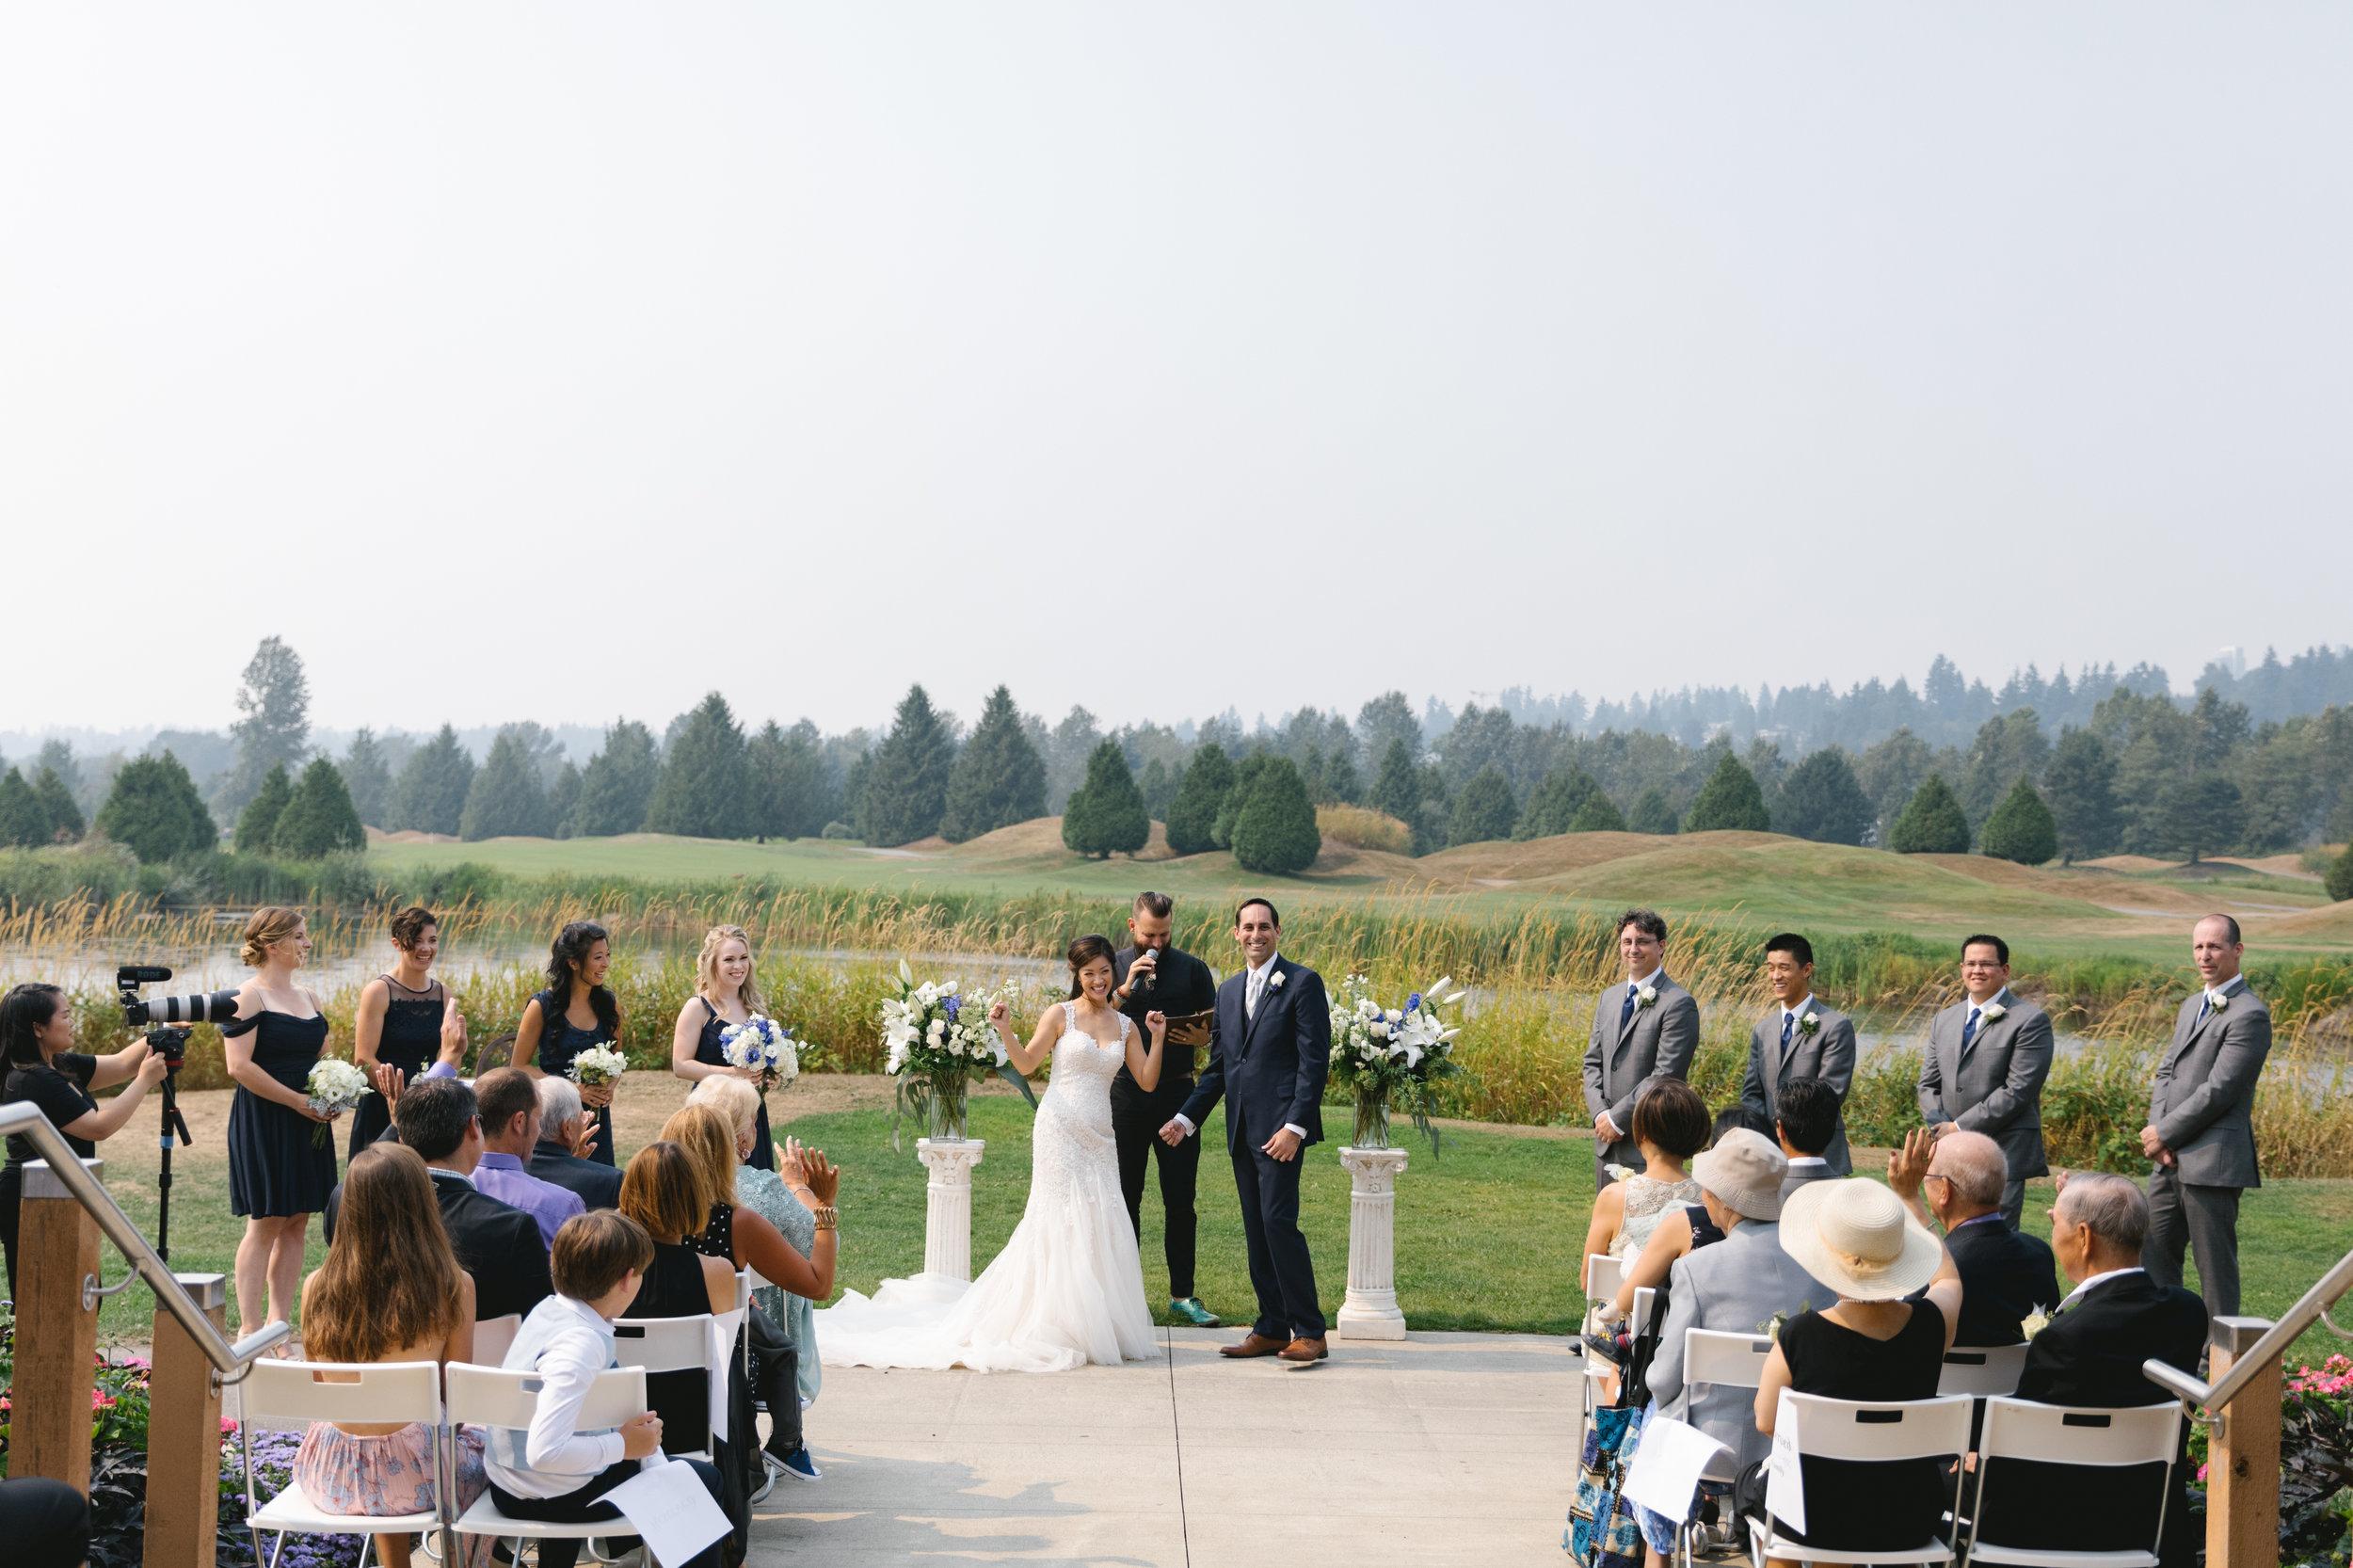 herastudios_wedding_jillian_tj_hera_selects-39.jpg